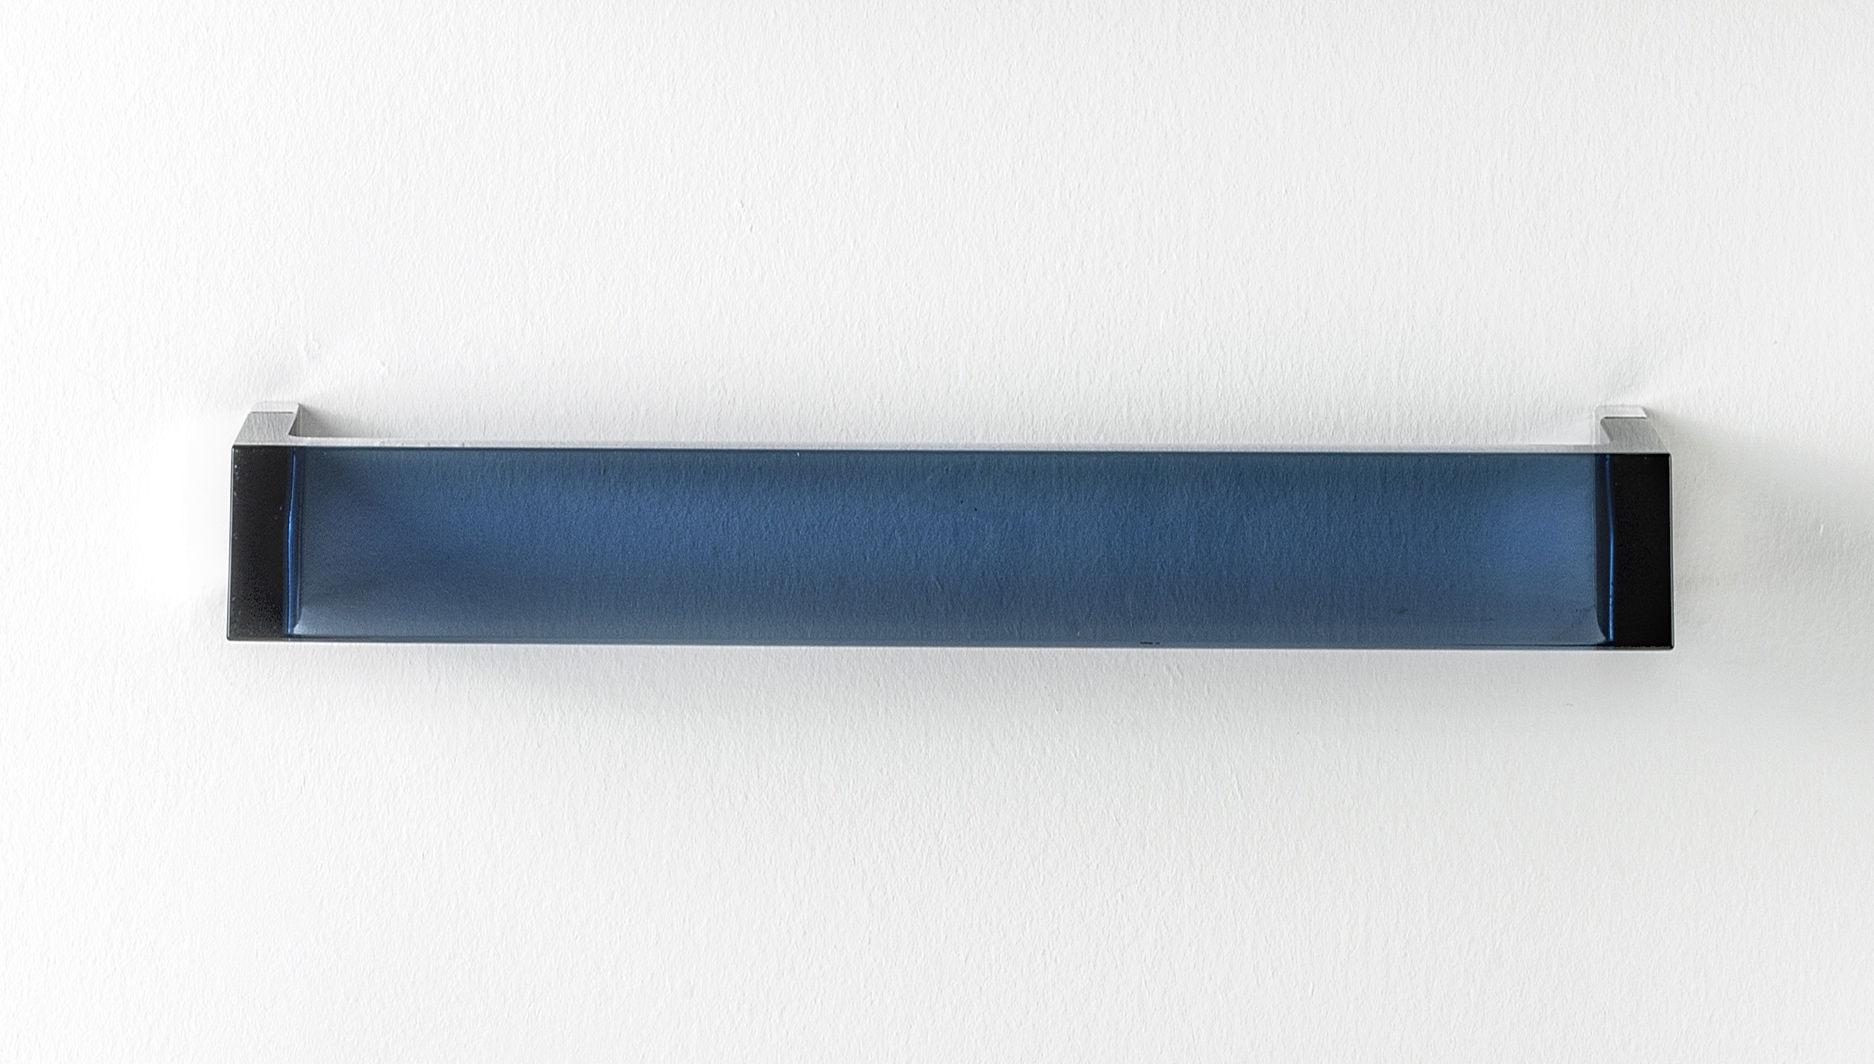 Scopri porte serviettes mural rail l 30 cm blu crepuscolo di kartell made in design italia - Kartell accessori bagno ...